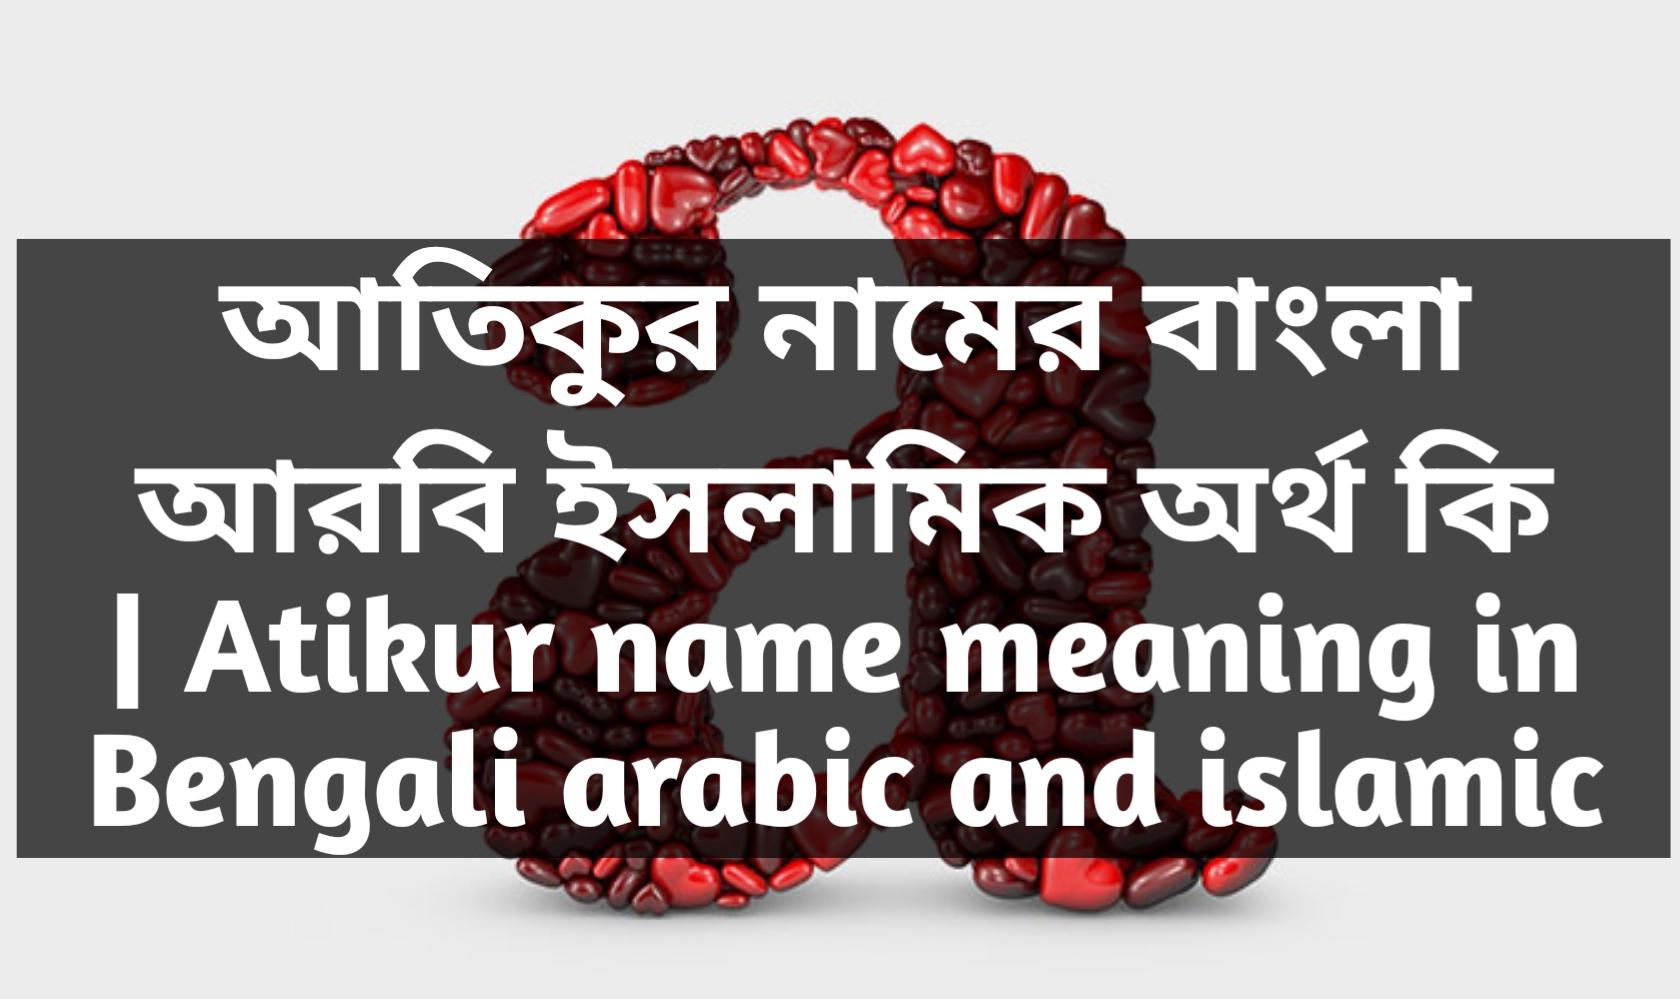 atikur name meaning in Bengali, আতিকুর নামের অর্থ কি, আতিকুর নামের বাংলা অর্থ কি, আতিকুর নামের ইসলামিক অর্থ কি,